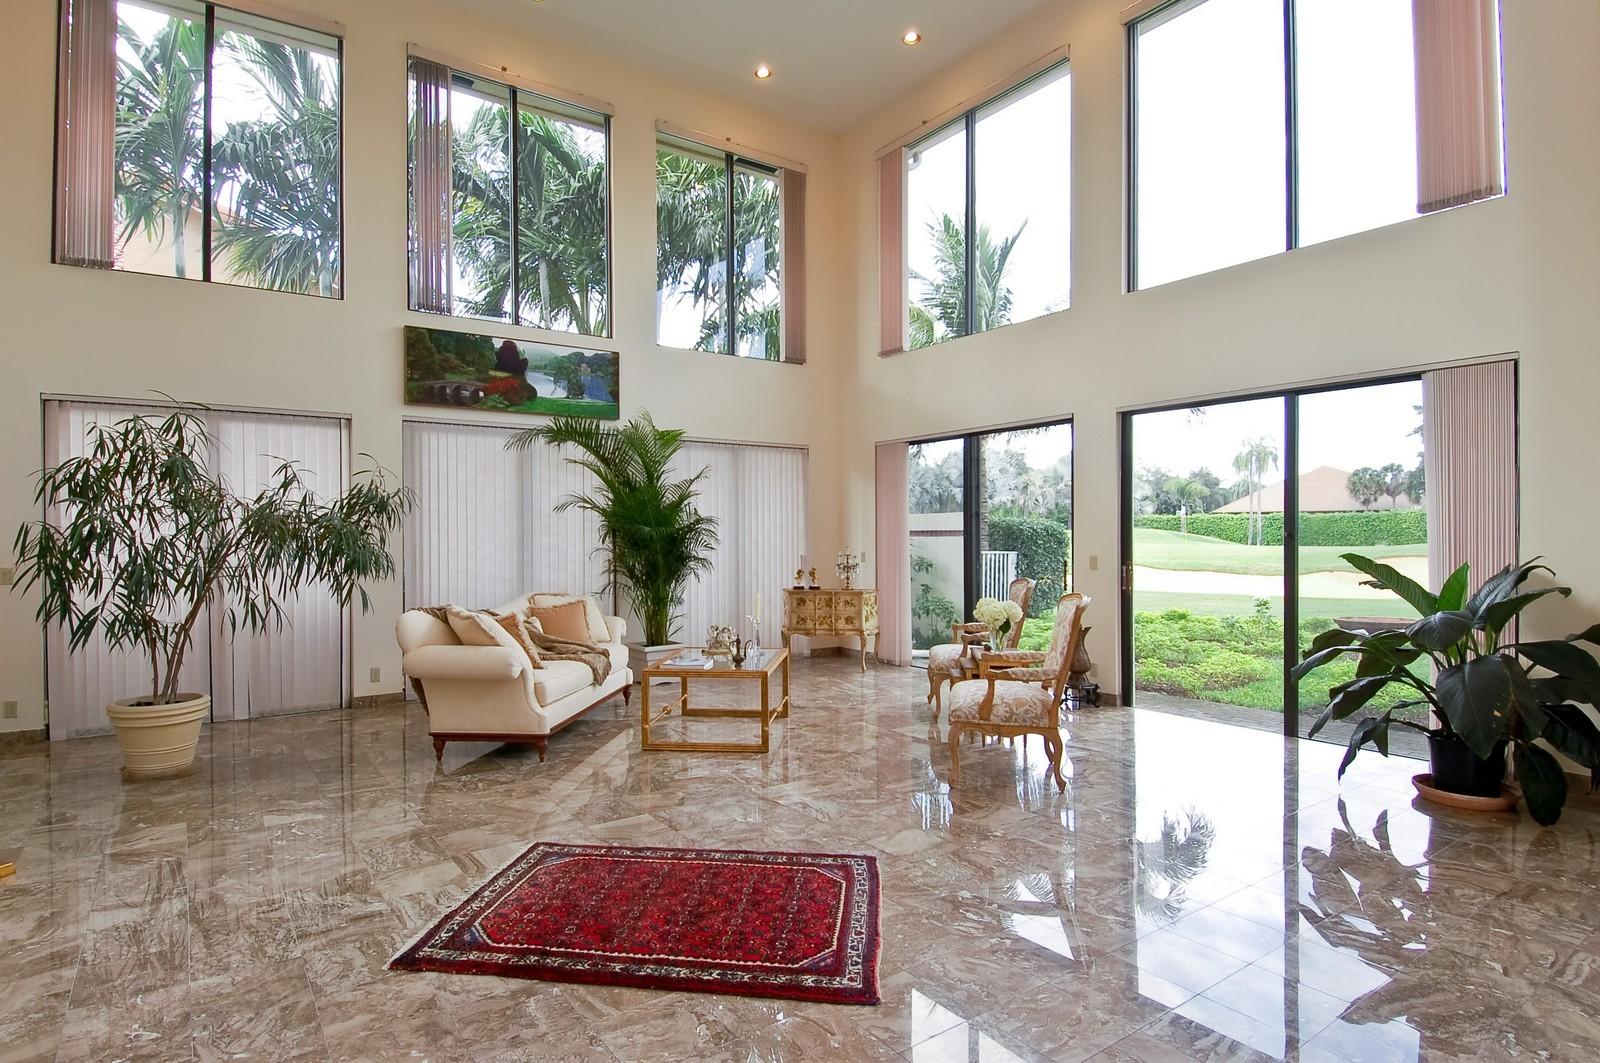 Real Estate Photography - 7339 Mandarin, Boca Raton, FL, 33433 - Living Room